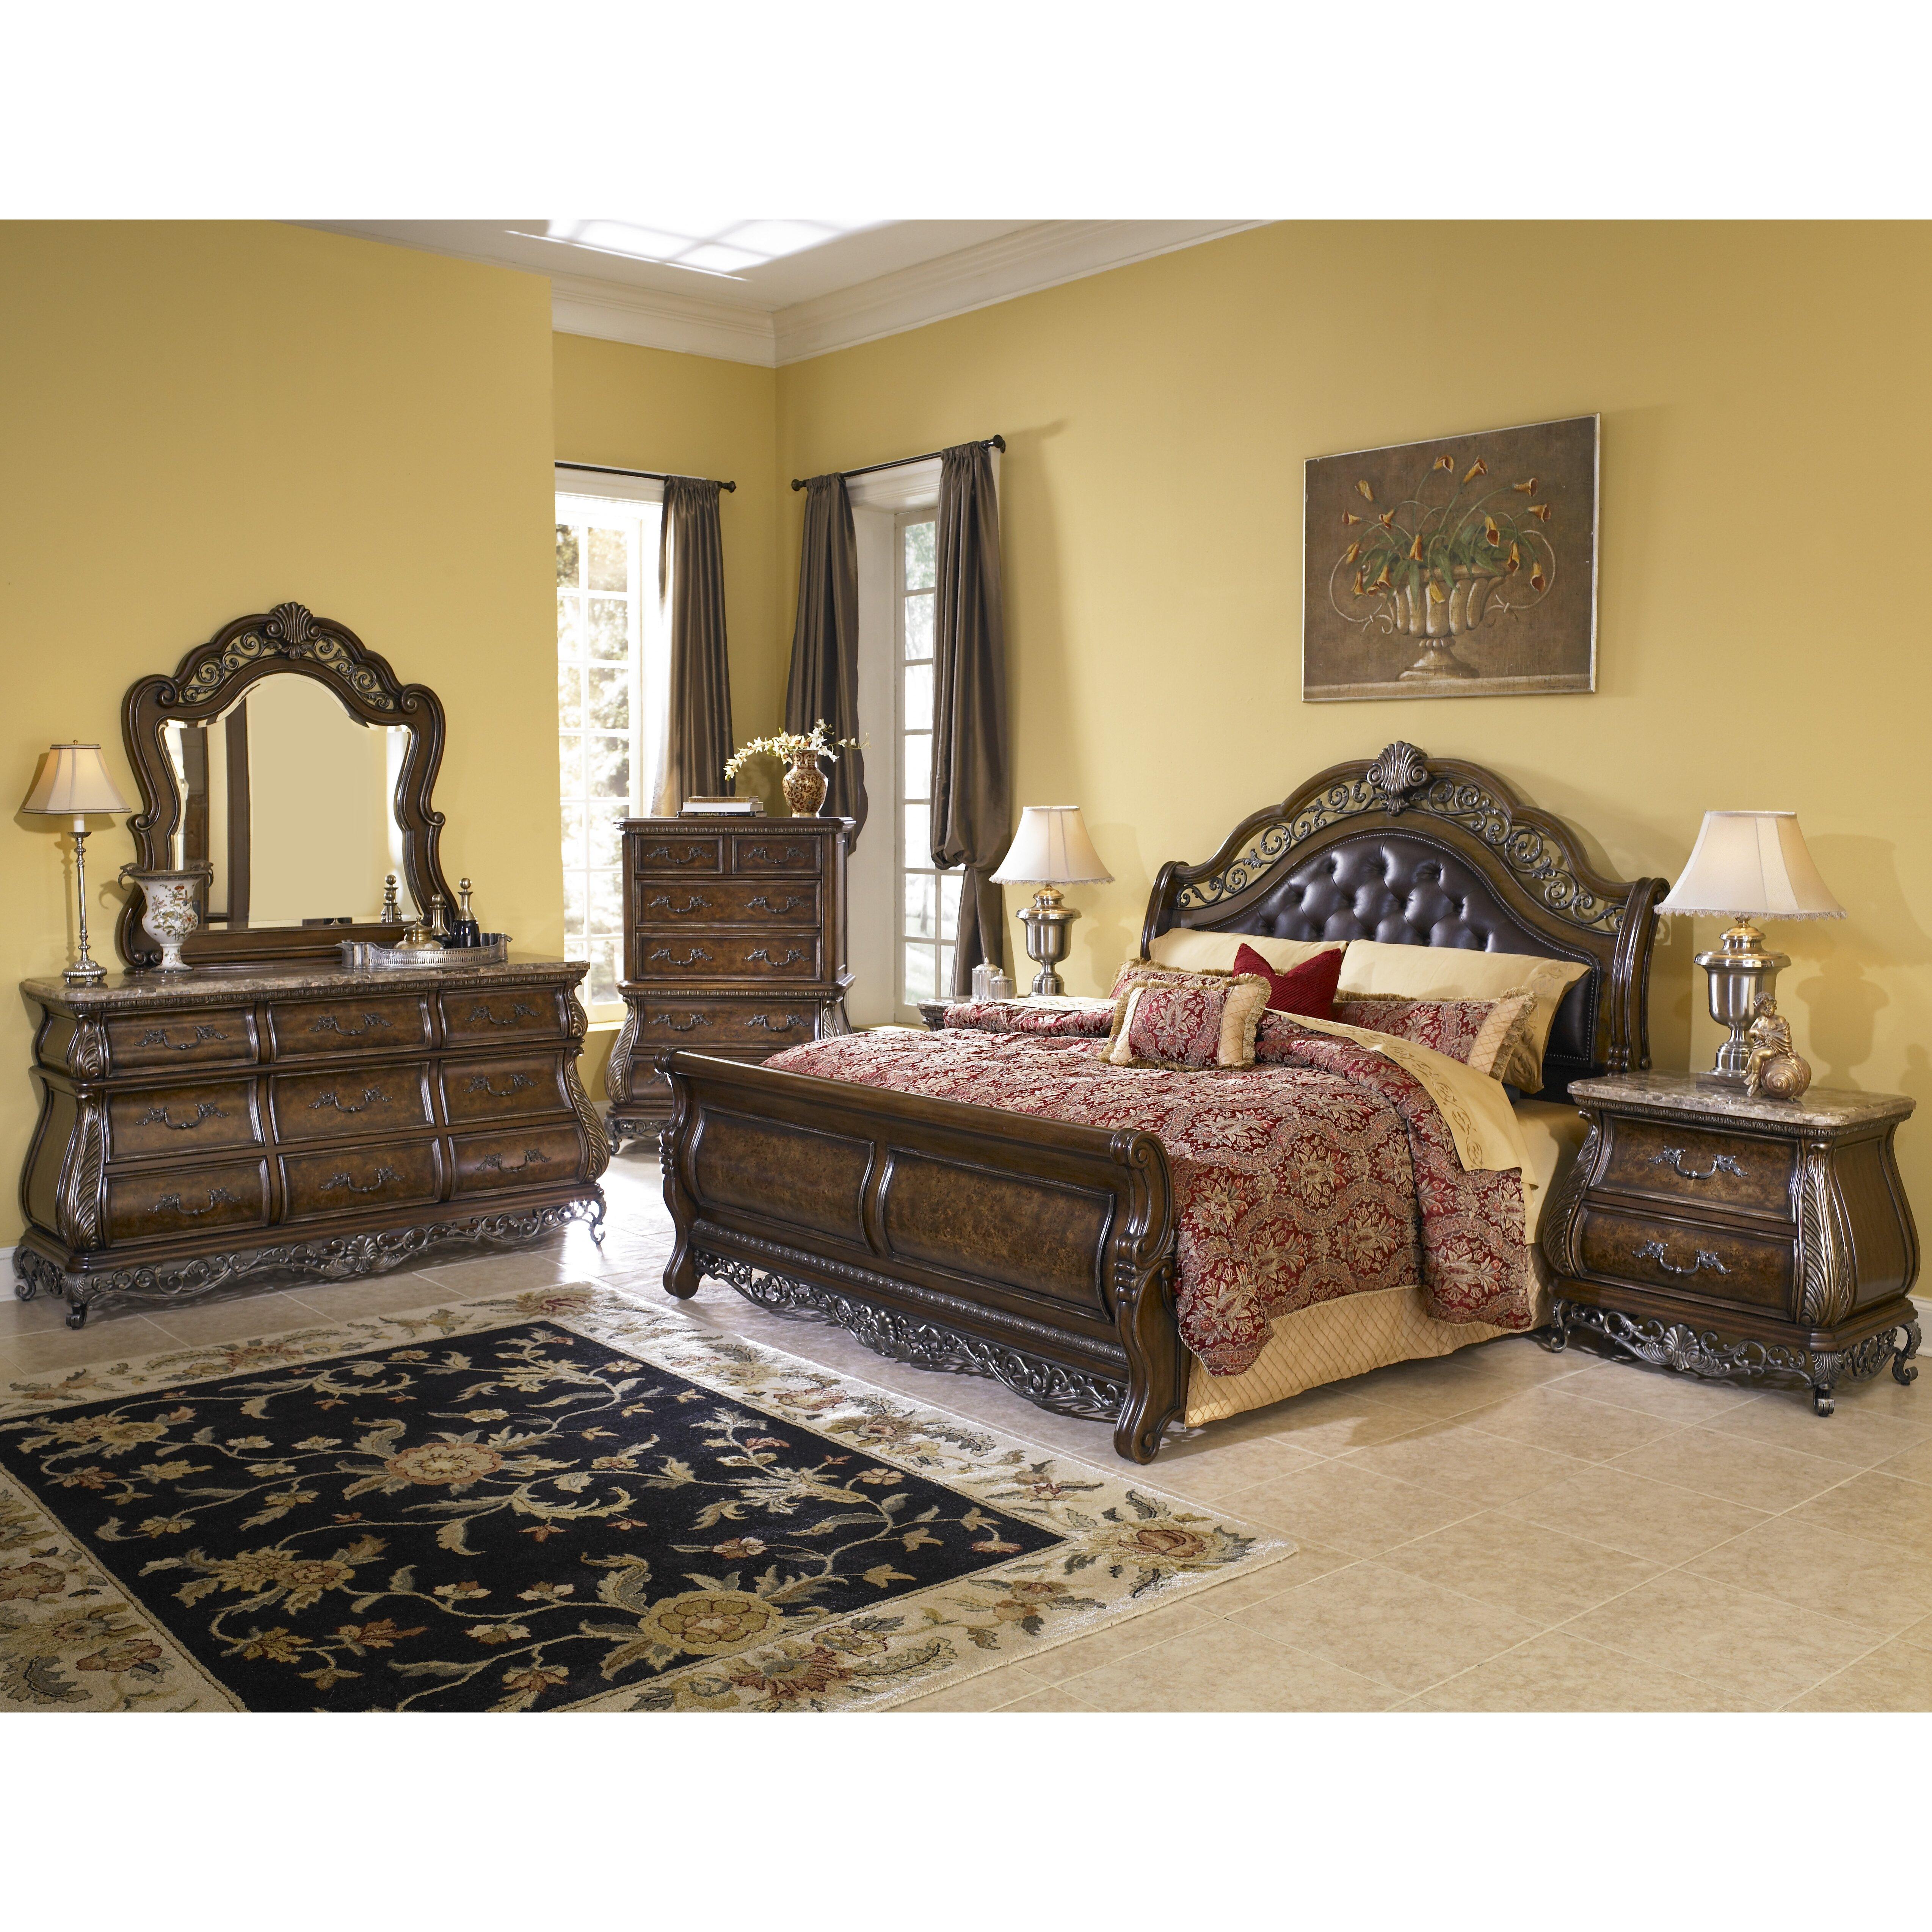 Pulaski Furniture Bedroom Sets Pulaski Birkhaven Sleigh Customizable Bedroom Set Reviews Wayfair